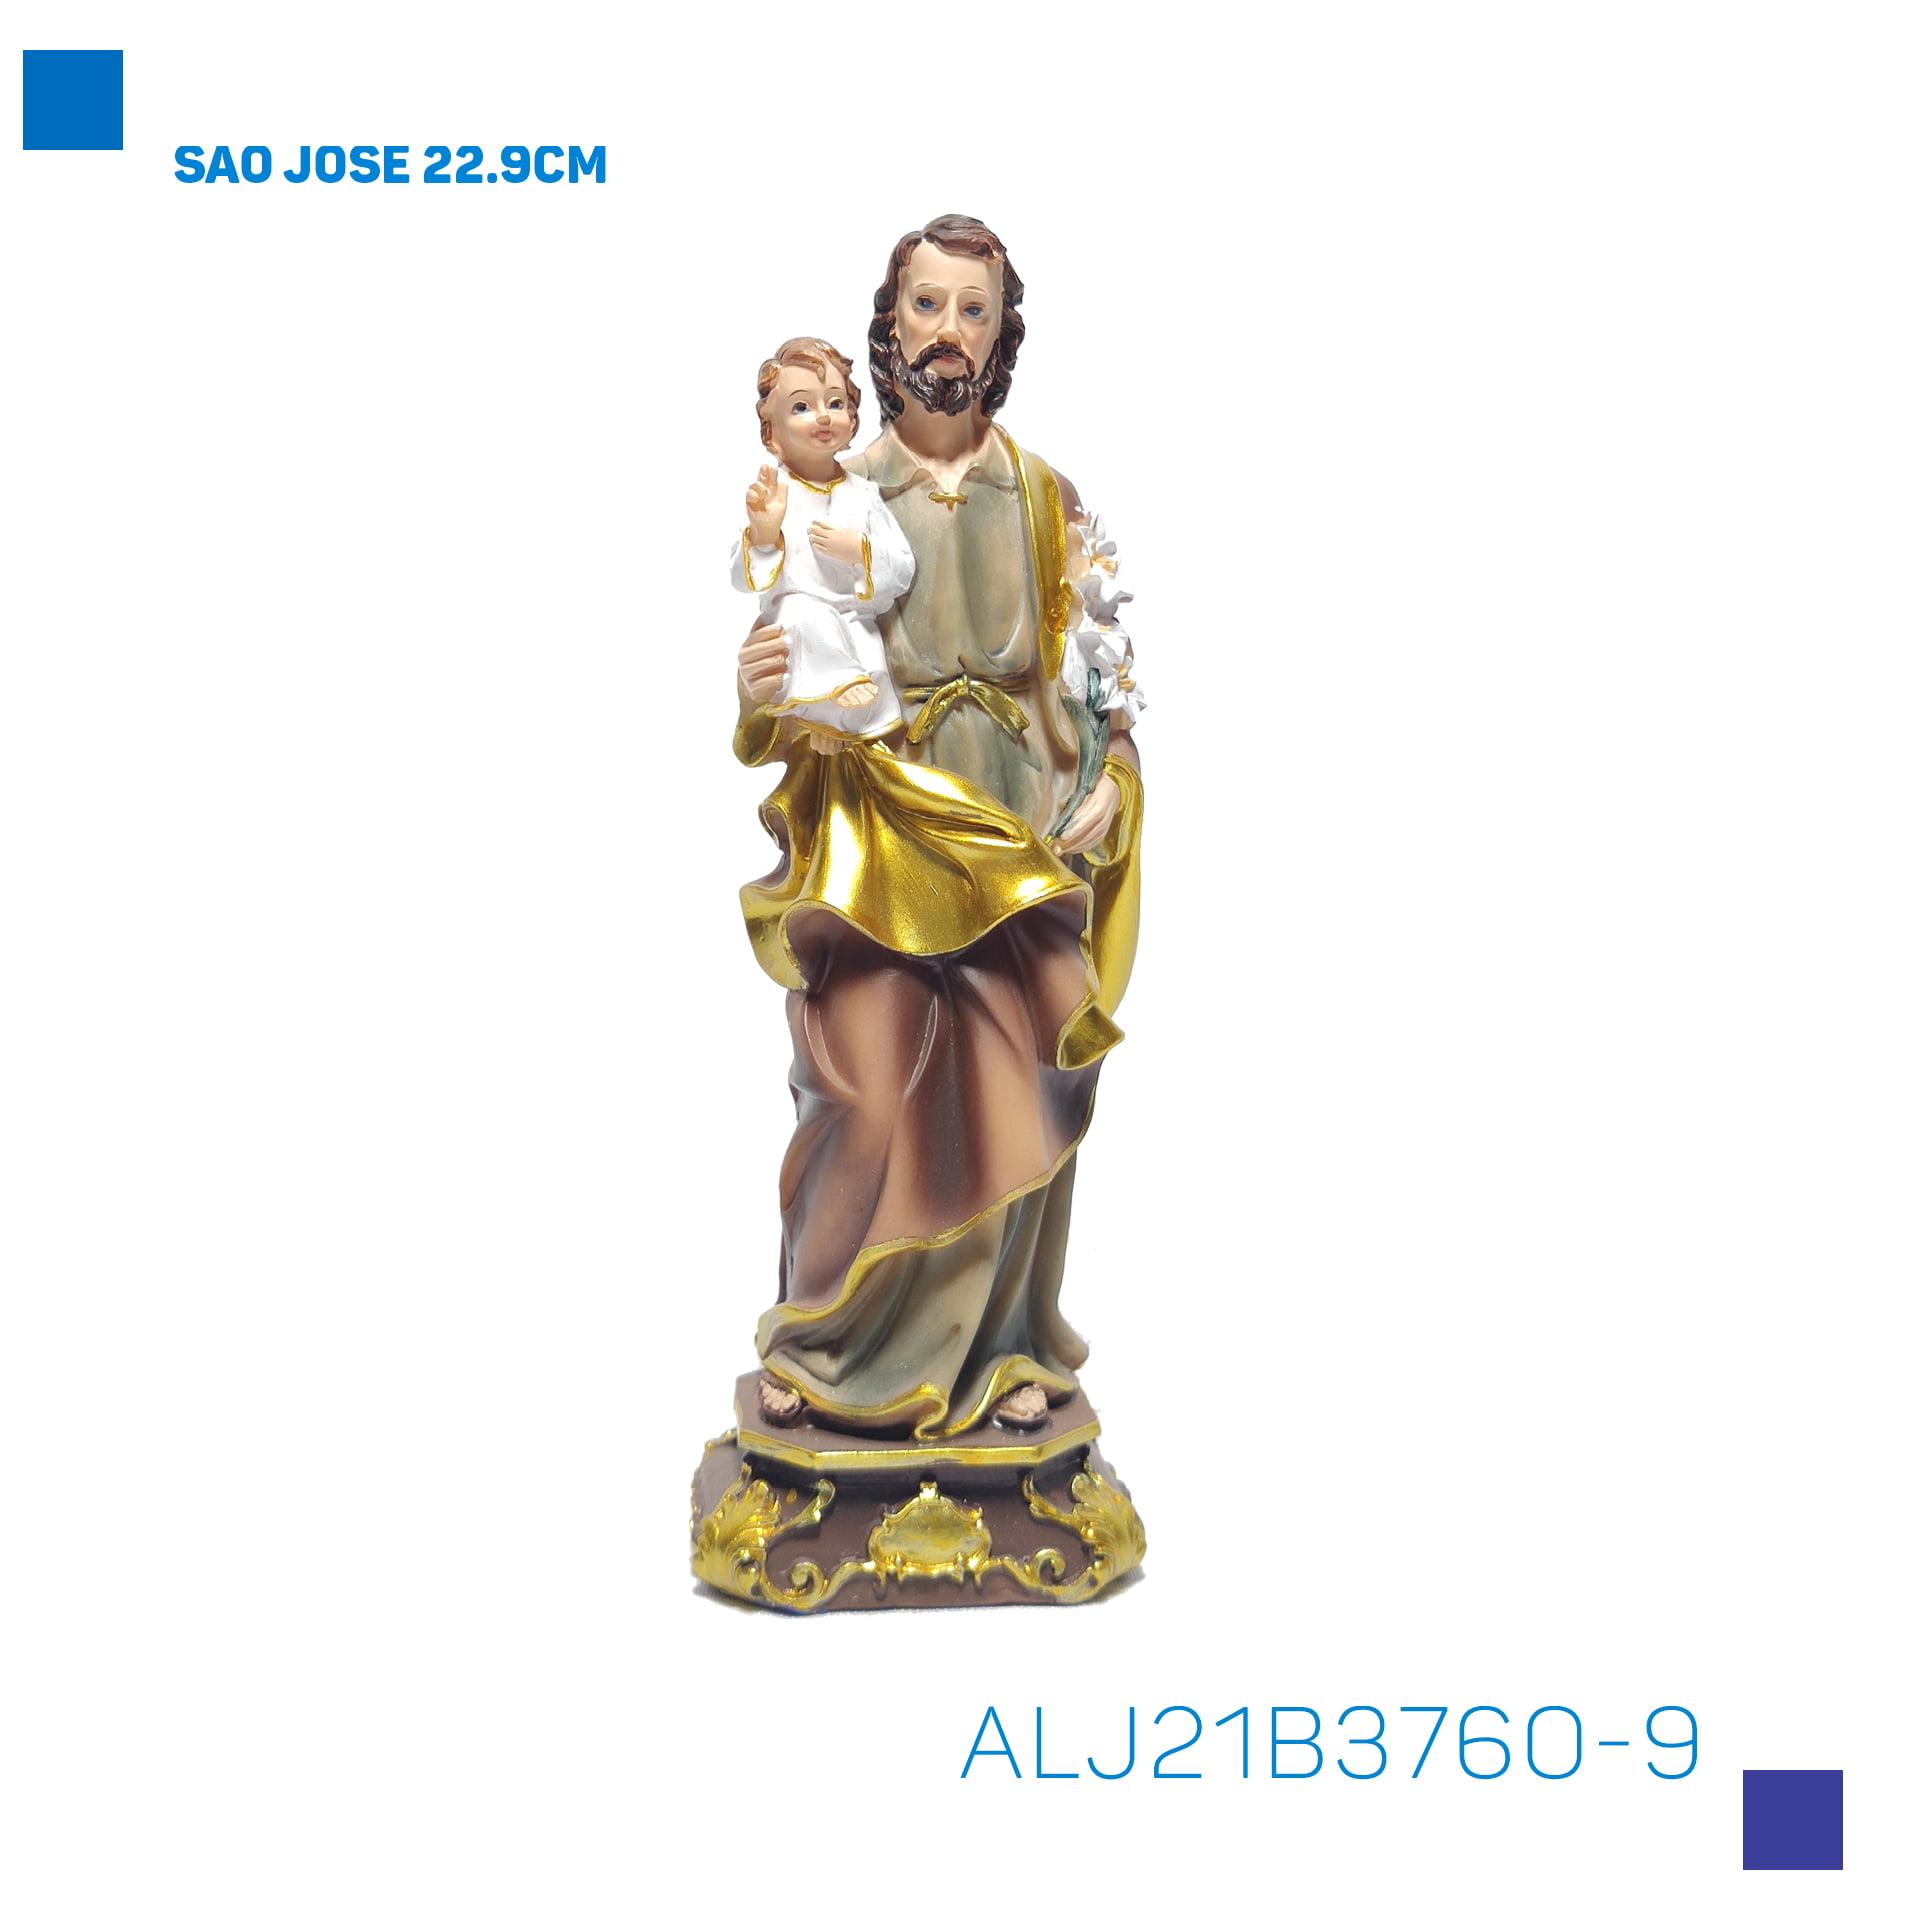 Bira Artigos Religiosos - SAO JOSE 22.9CM - Cód . ALJ21B376O-9